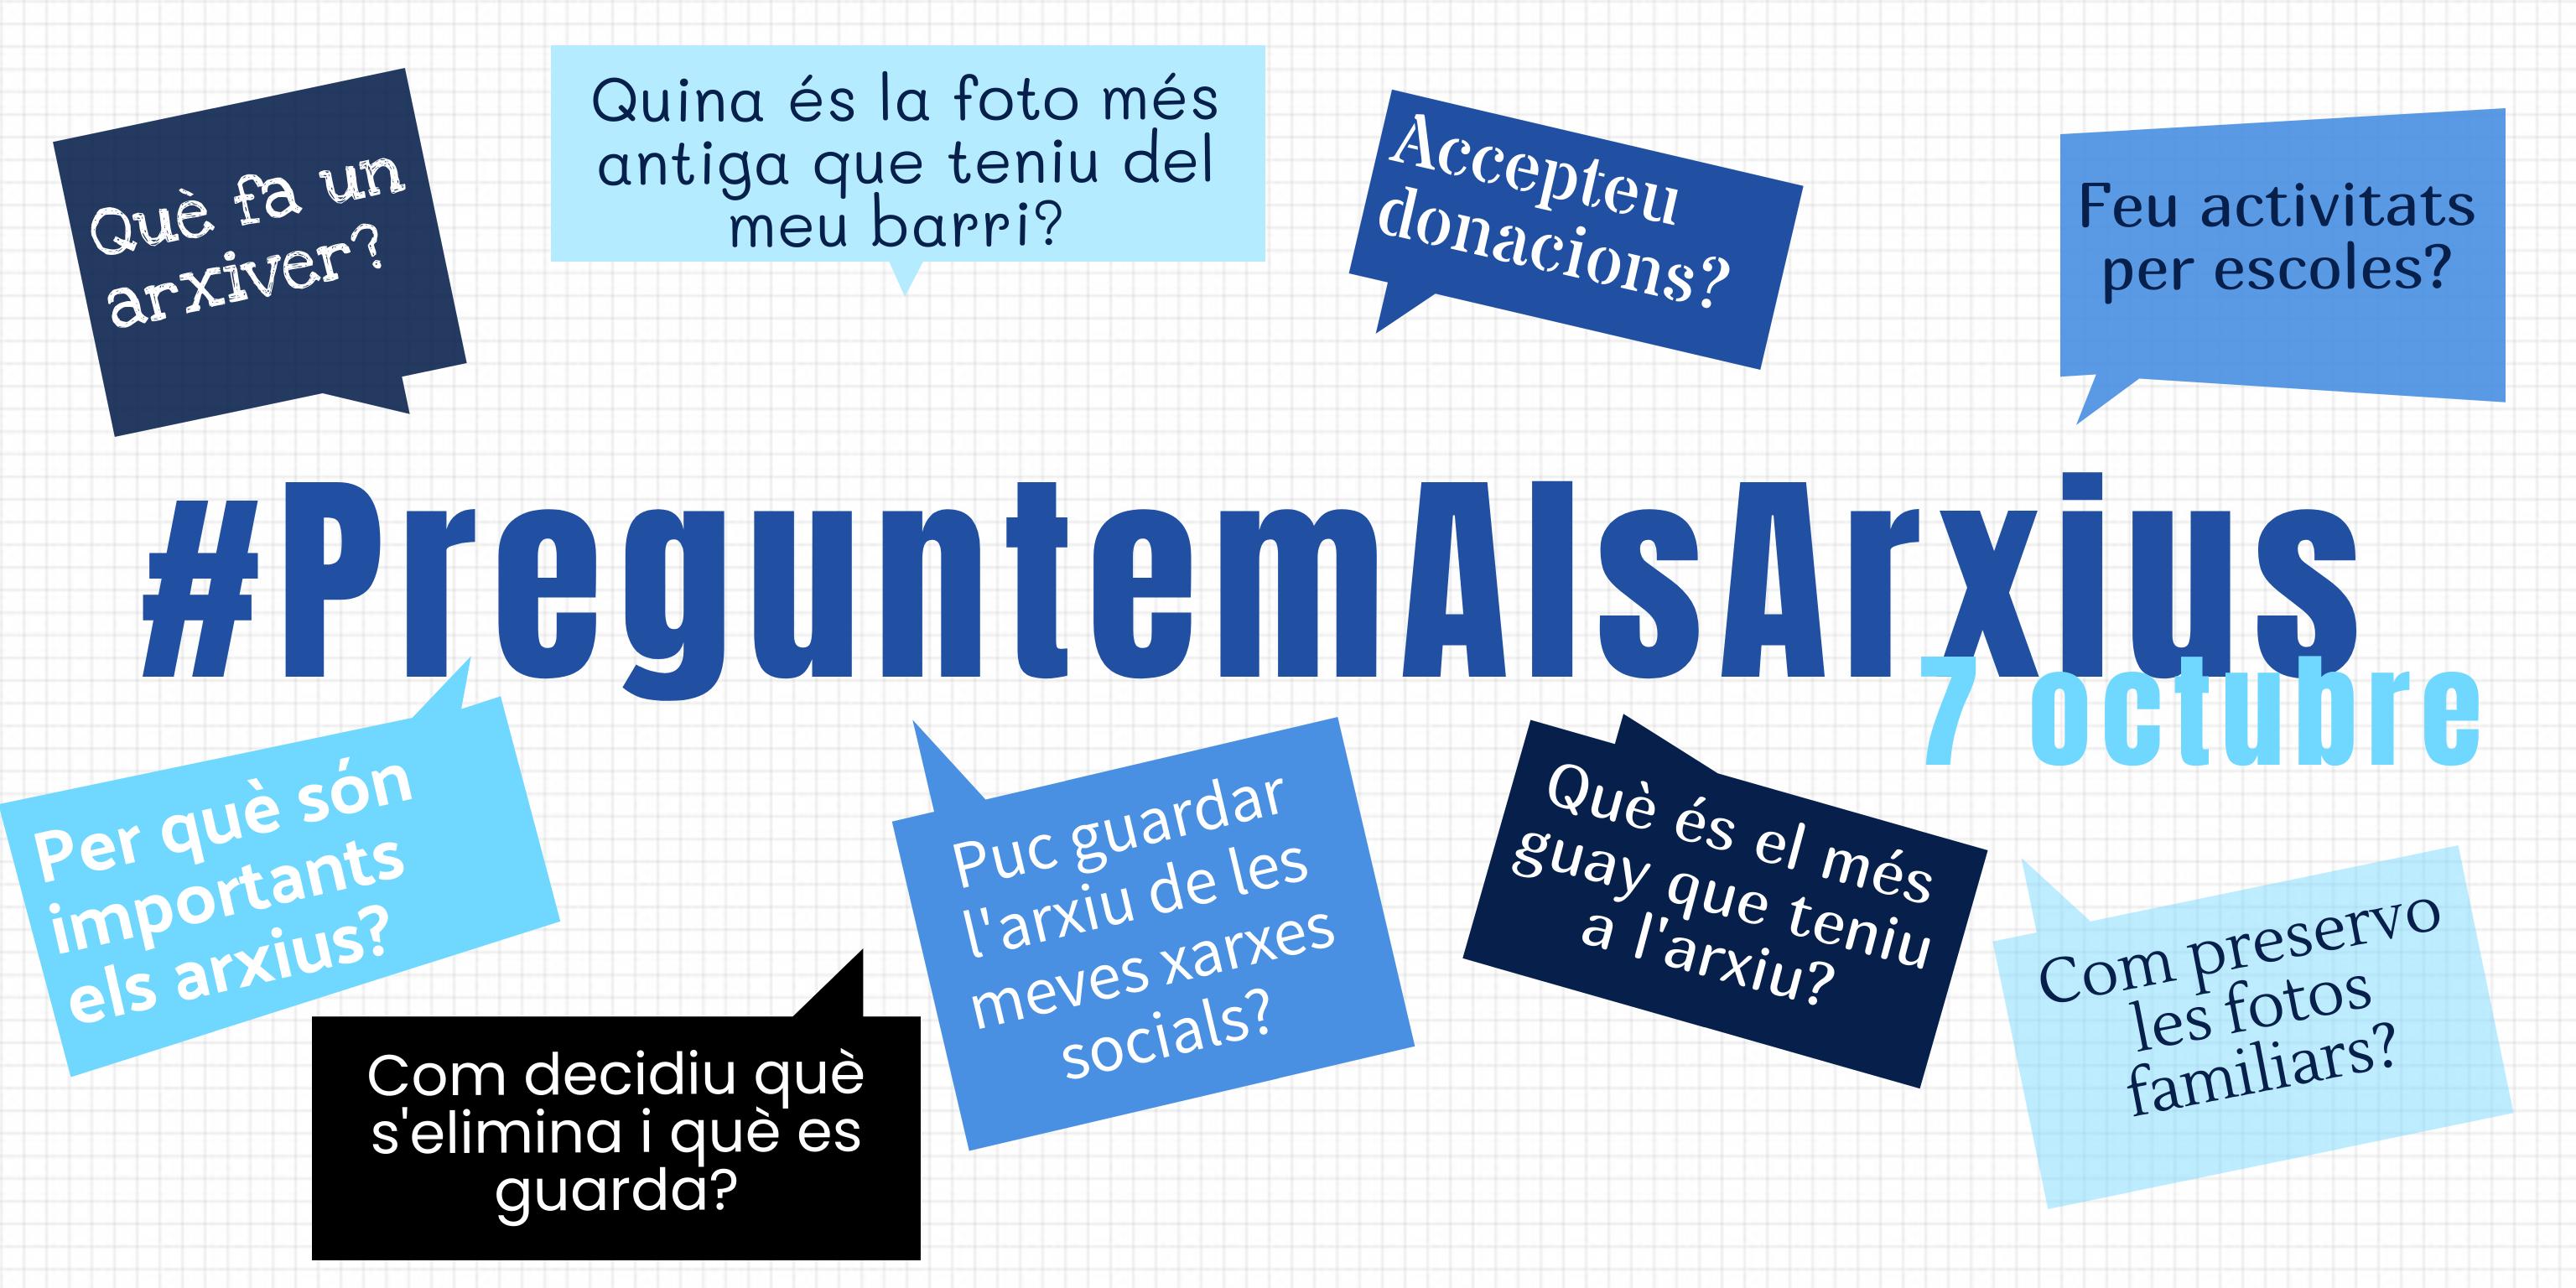 Dimecres 7 d'octubre, #PreguntemAlsArxius !!!